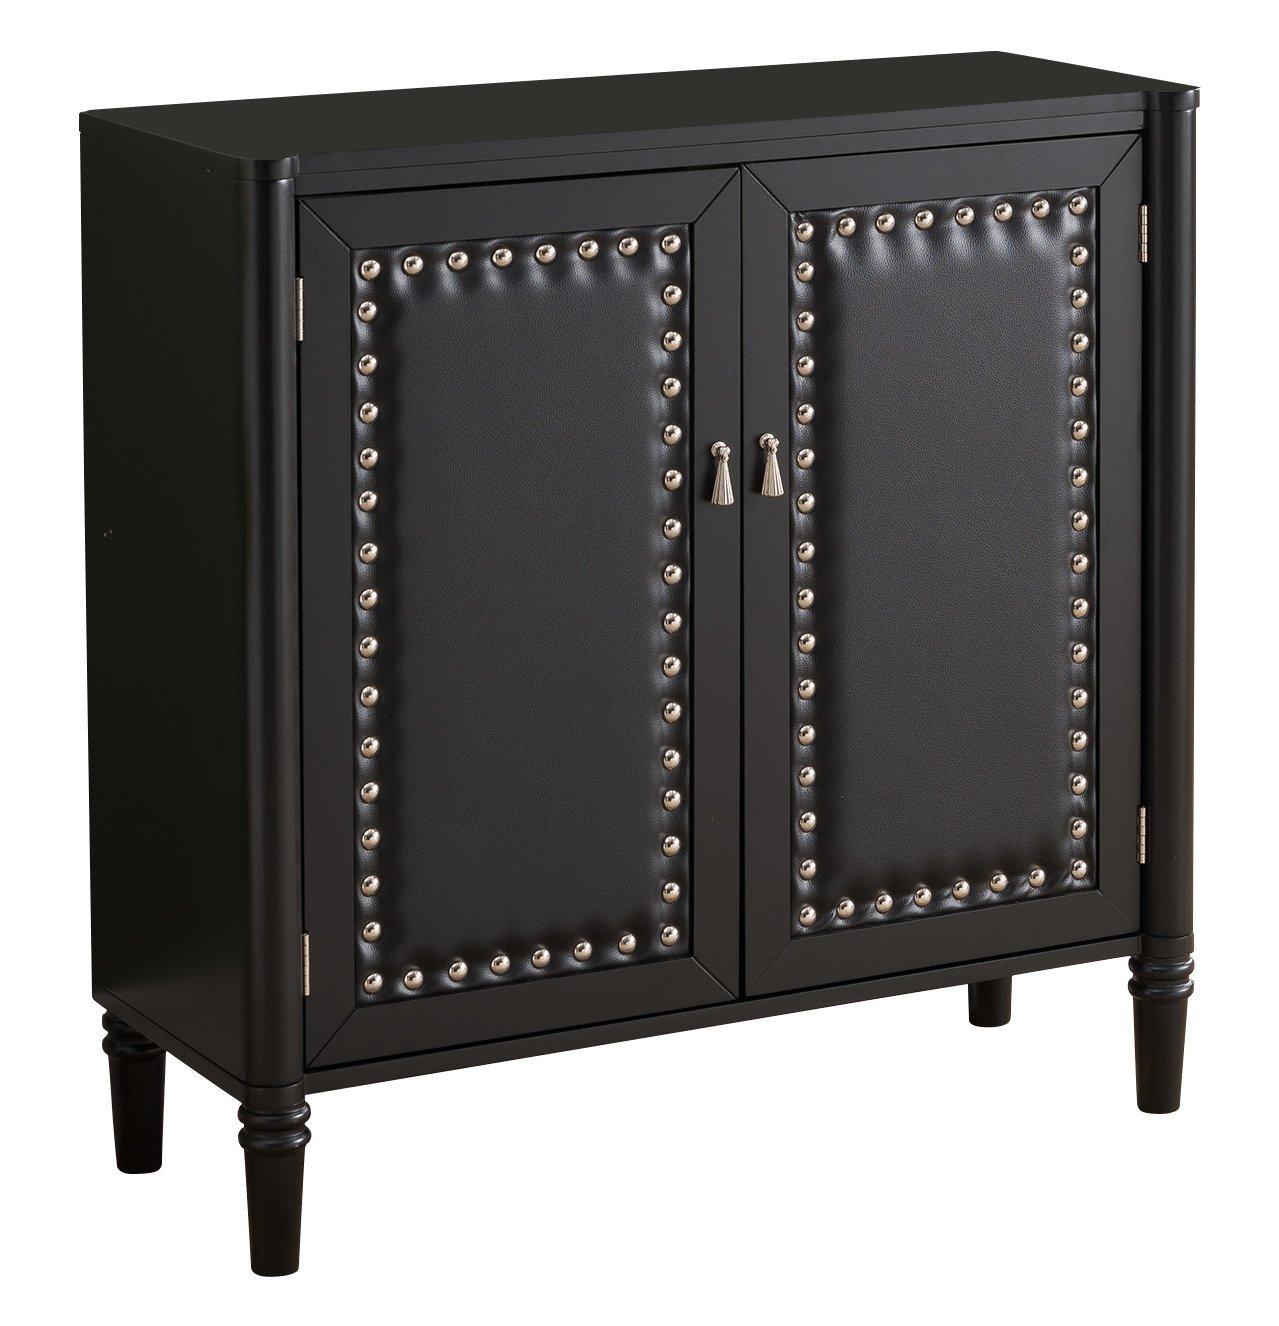 Kings Brand Furniture 2 Door Entryway Console Table Accent Cabinet, Black by Kings Brand Furniture (Image #5)